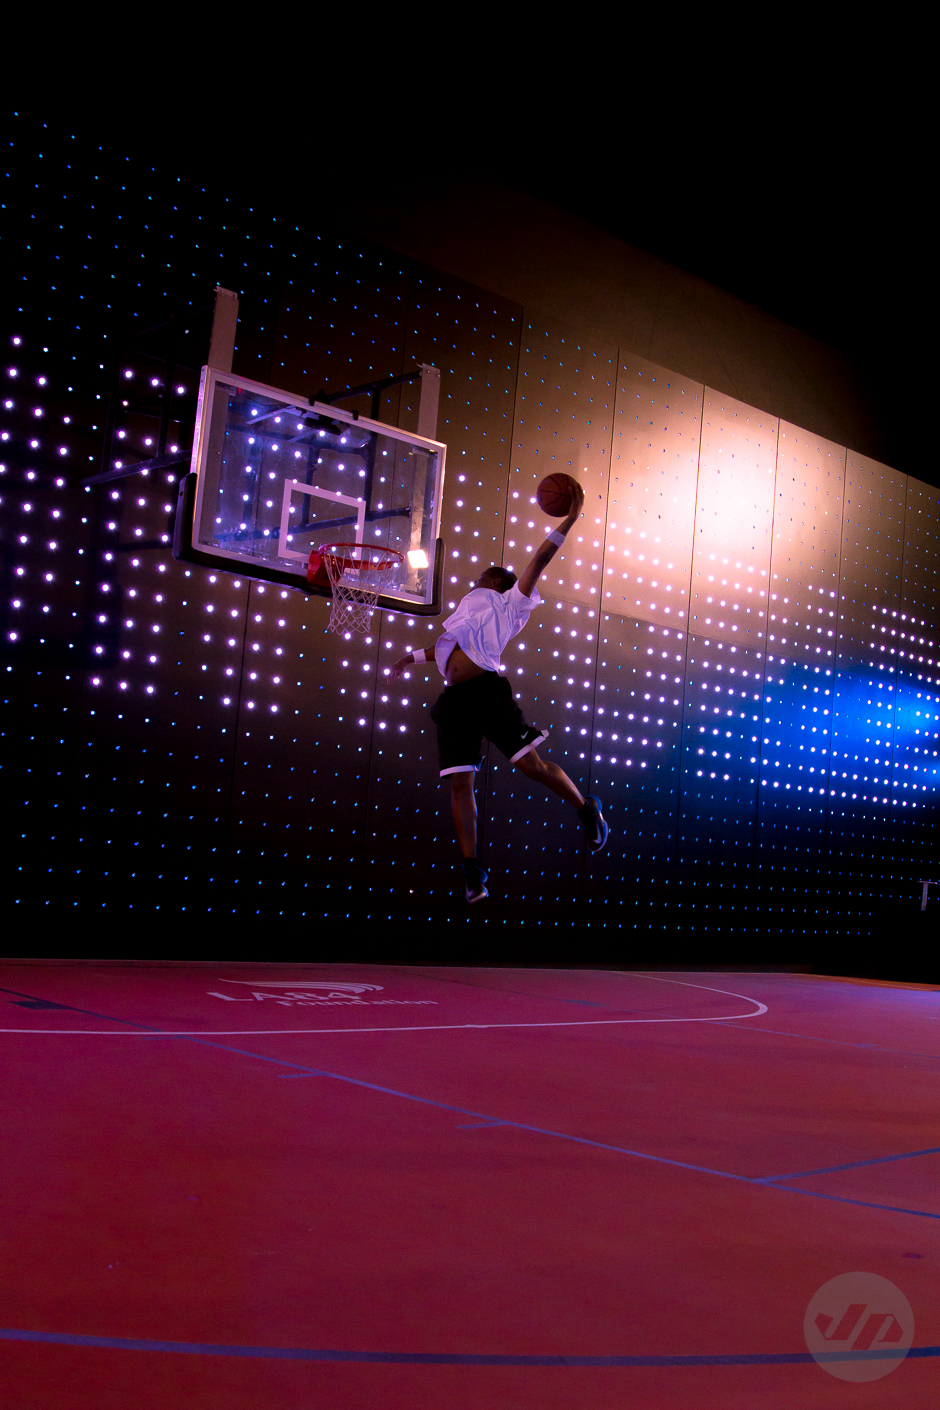 6.28.12-Nike-GameOnWorld.jpg